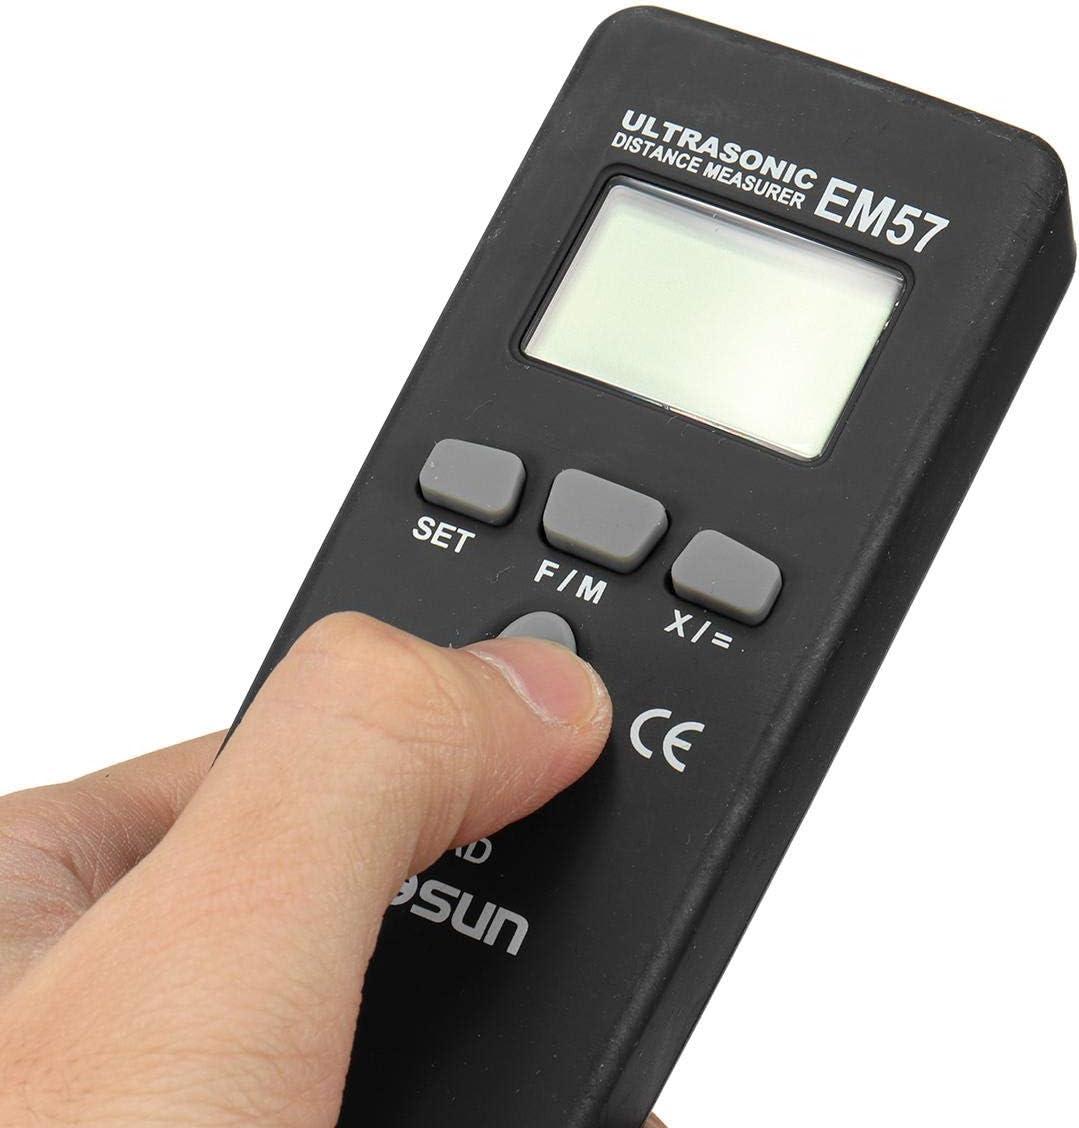 TnSok Telémetros láser Portátil Medidor De La Distancia Télémètre Mini Telémetro Contratista Grado (Color : Black, Size : A)